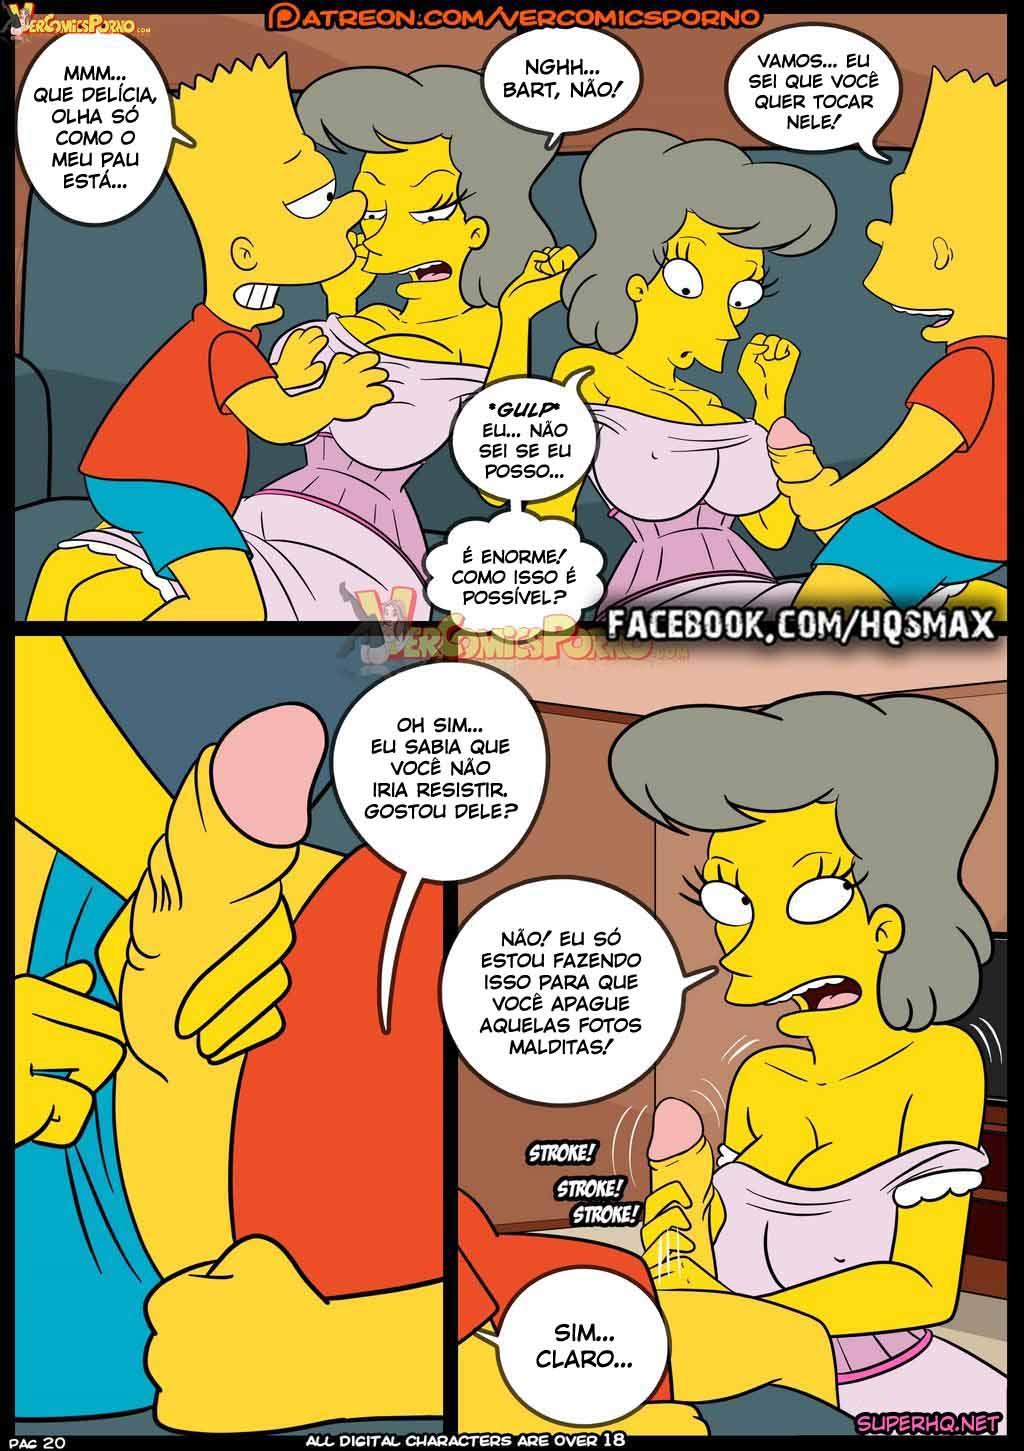 Old Habits 8 - Suruba com todos dessa família incestuosa, os Simpsons